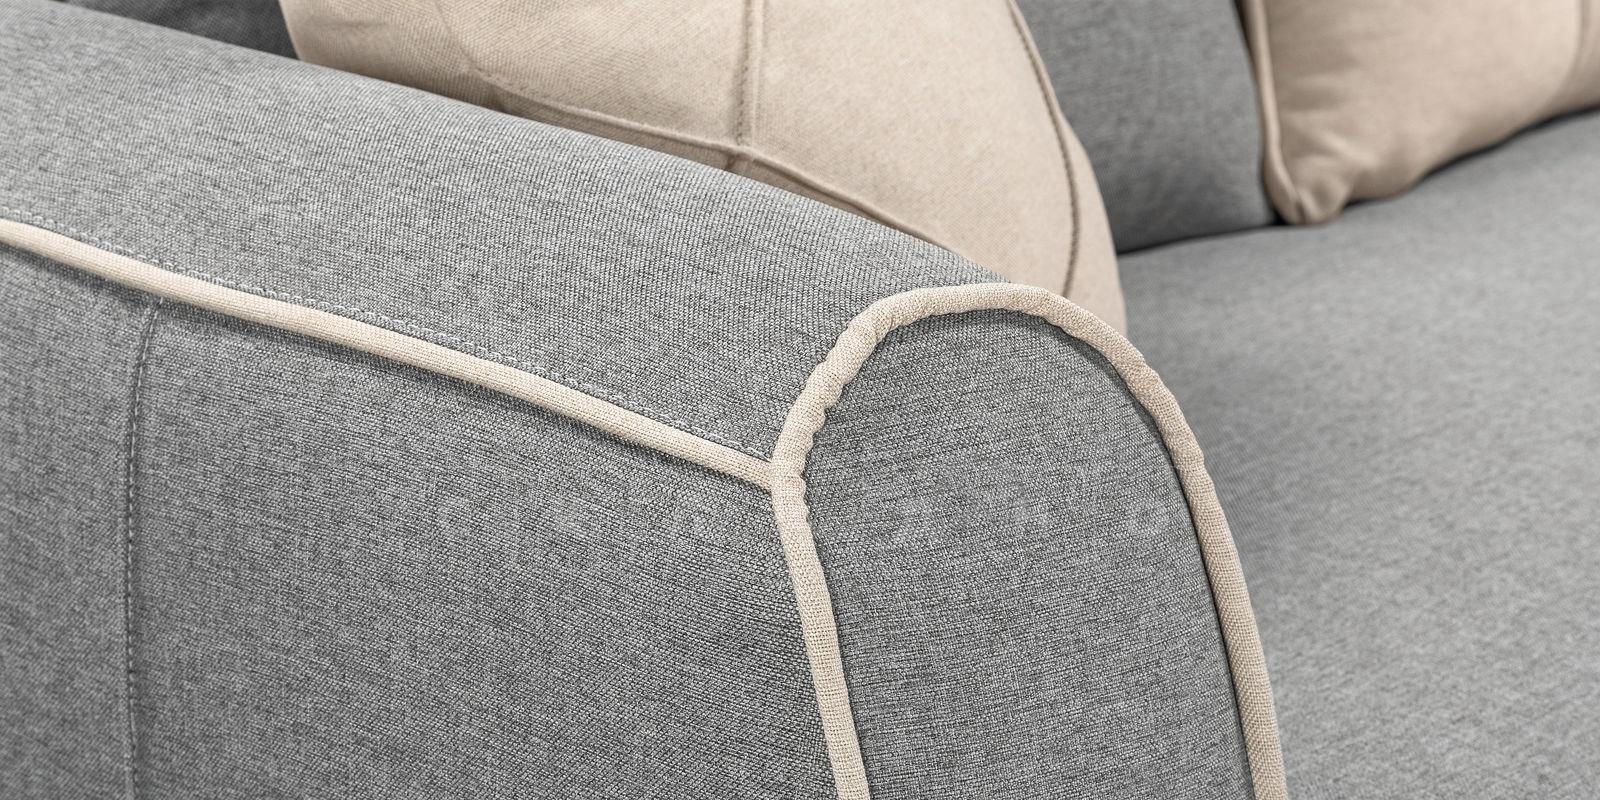 Диван Флэтфорд рогожка серый цвет фото 5 | интернет-магазин Складно